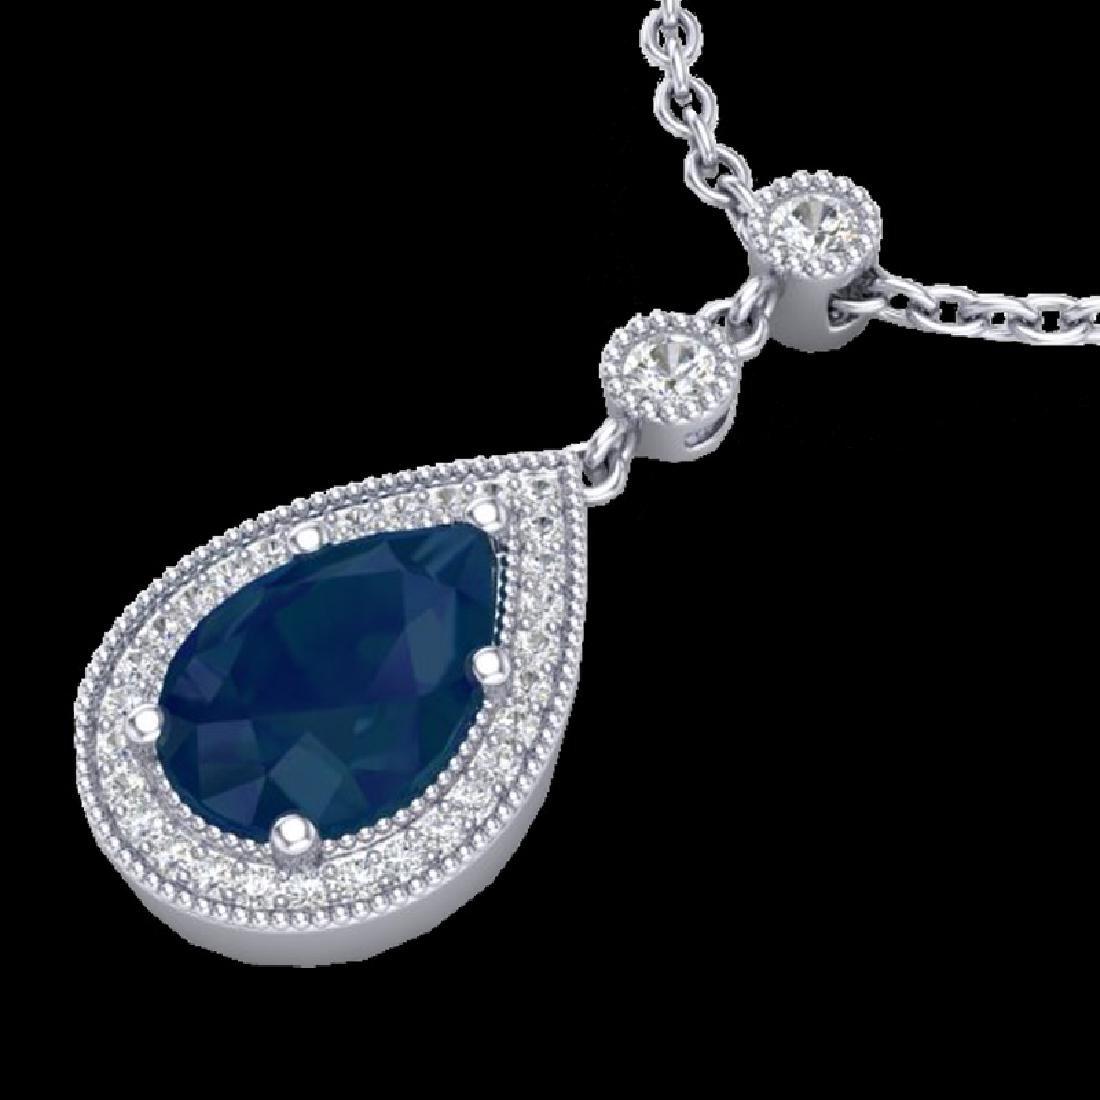 2.75 CTW Sapphire & Micro Pave VS/SI Diamond Necklace